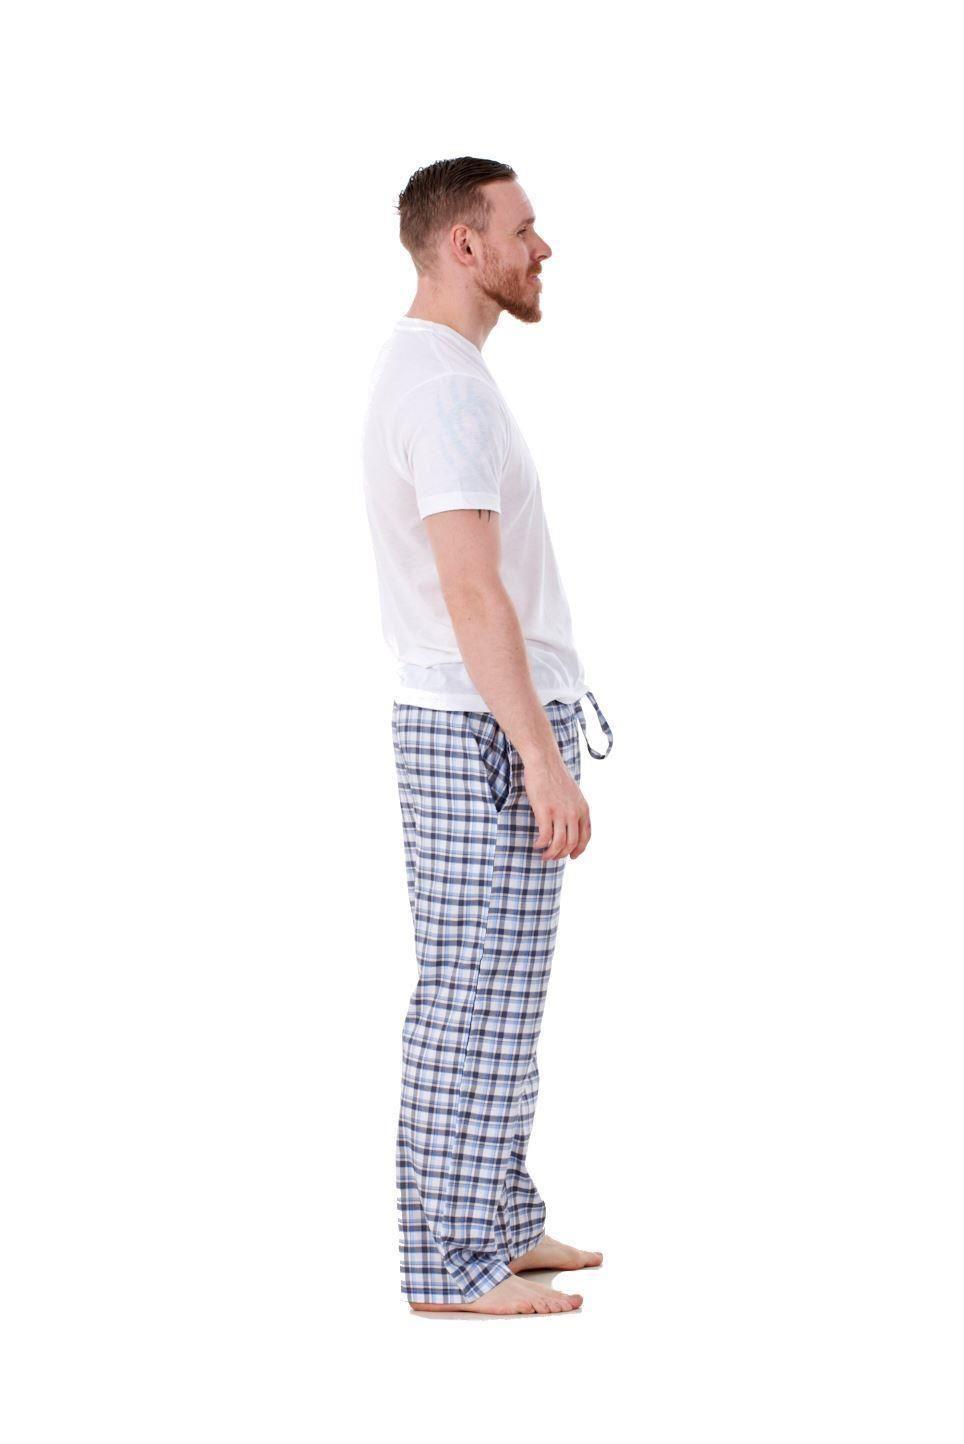 Mens-Pyjama-Bottoms-Rich-Cotton-Woven-Check-Lounge-Pant-Nightwear-Big-3XL-to-5XL Indexbild 66